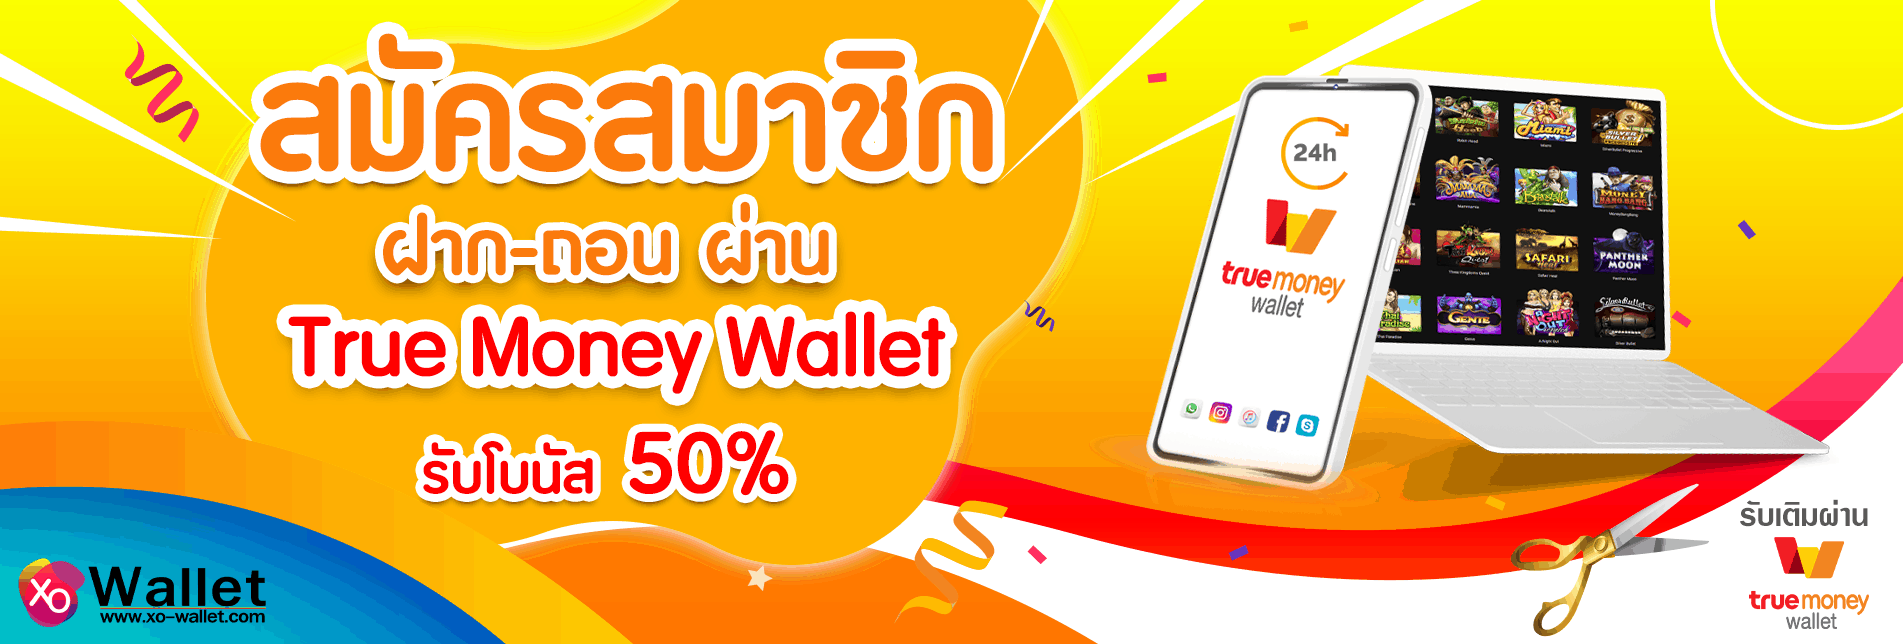 slotxo true wallet ไม่มีขั้นต่ำ